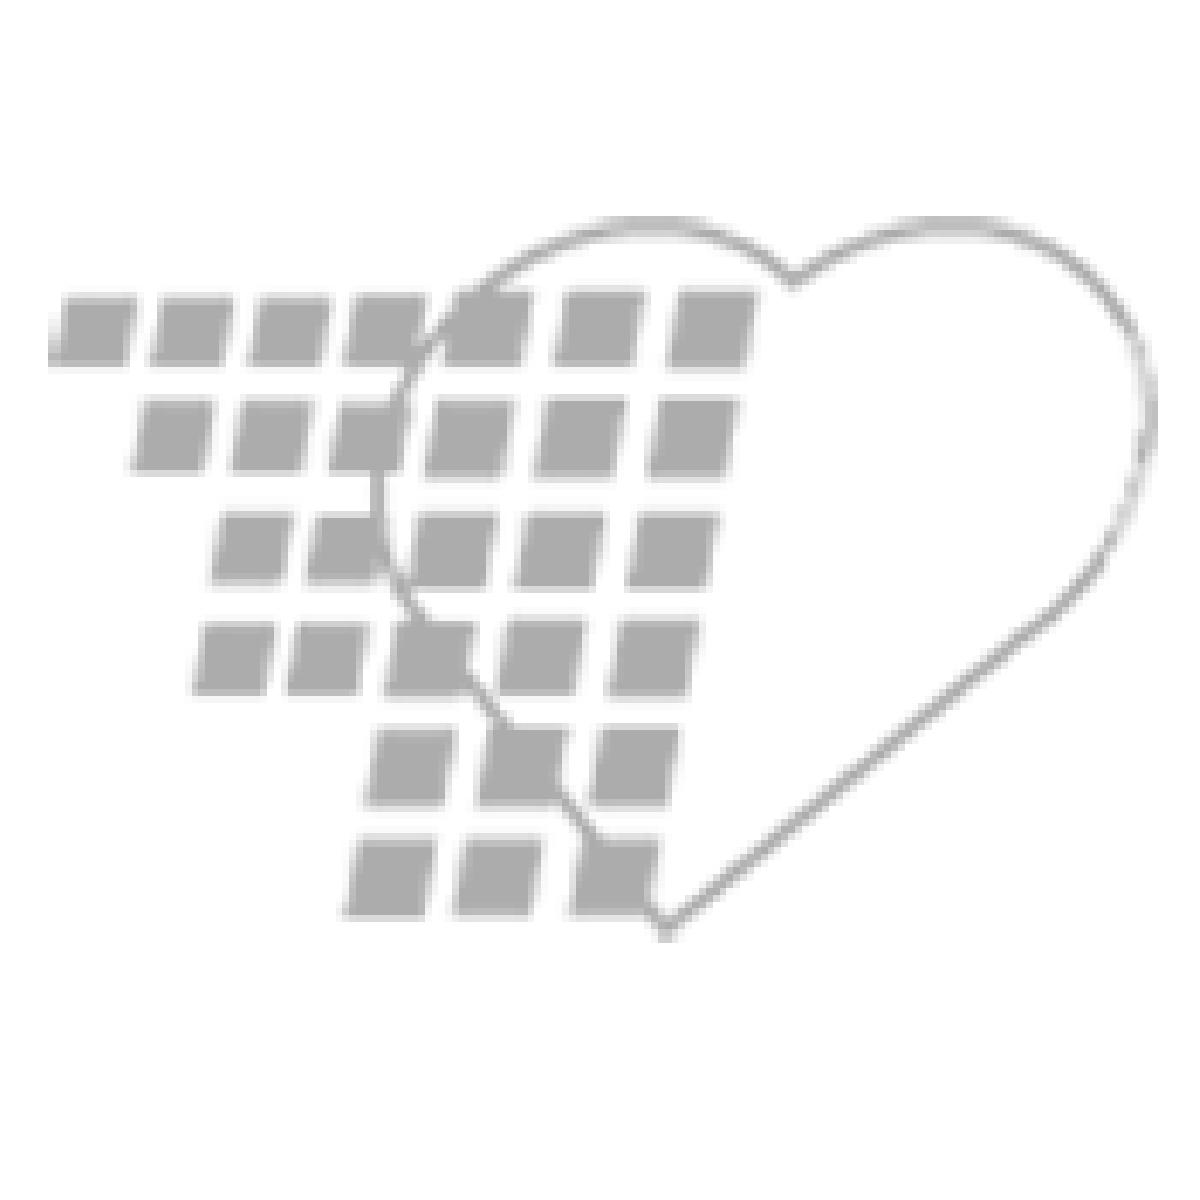 07-07-2016 - Graham Field John Bunn Vacutec 800 EV2 Aspirator